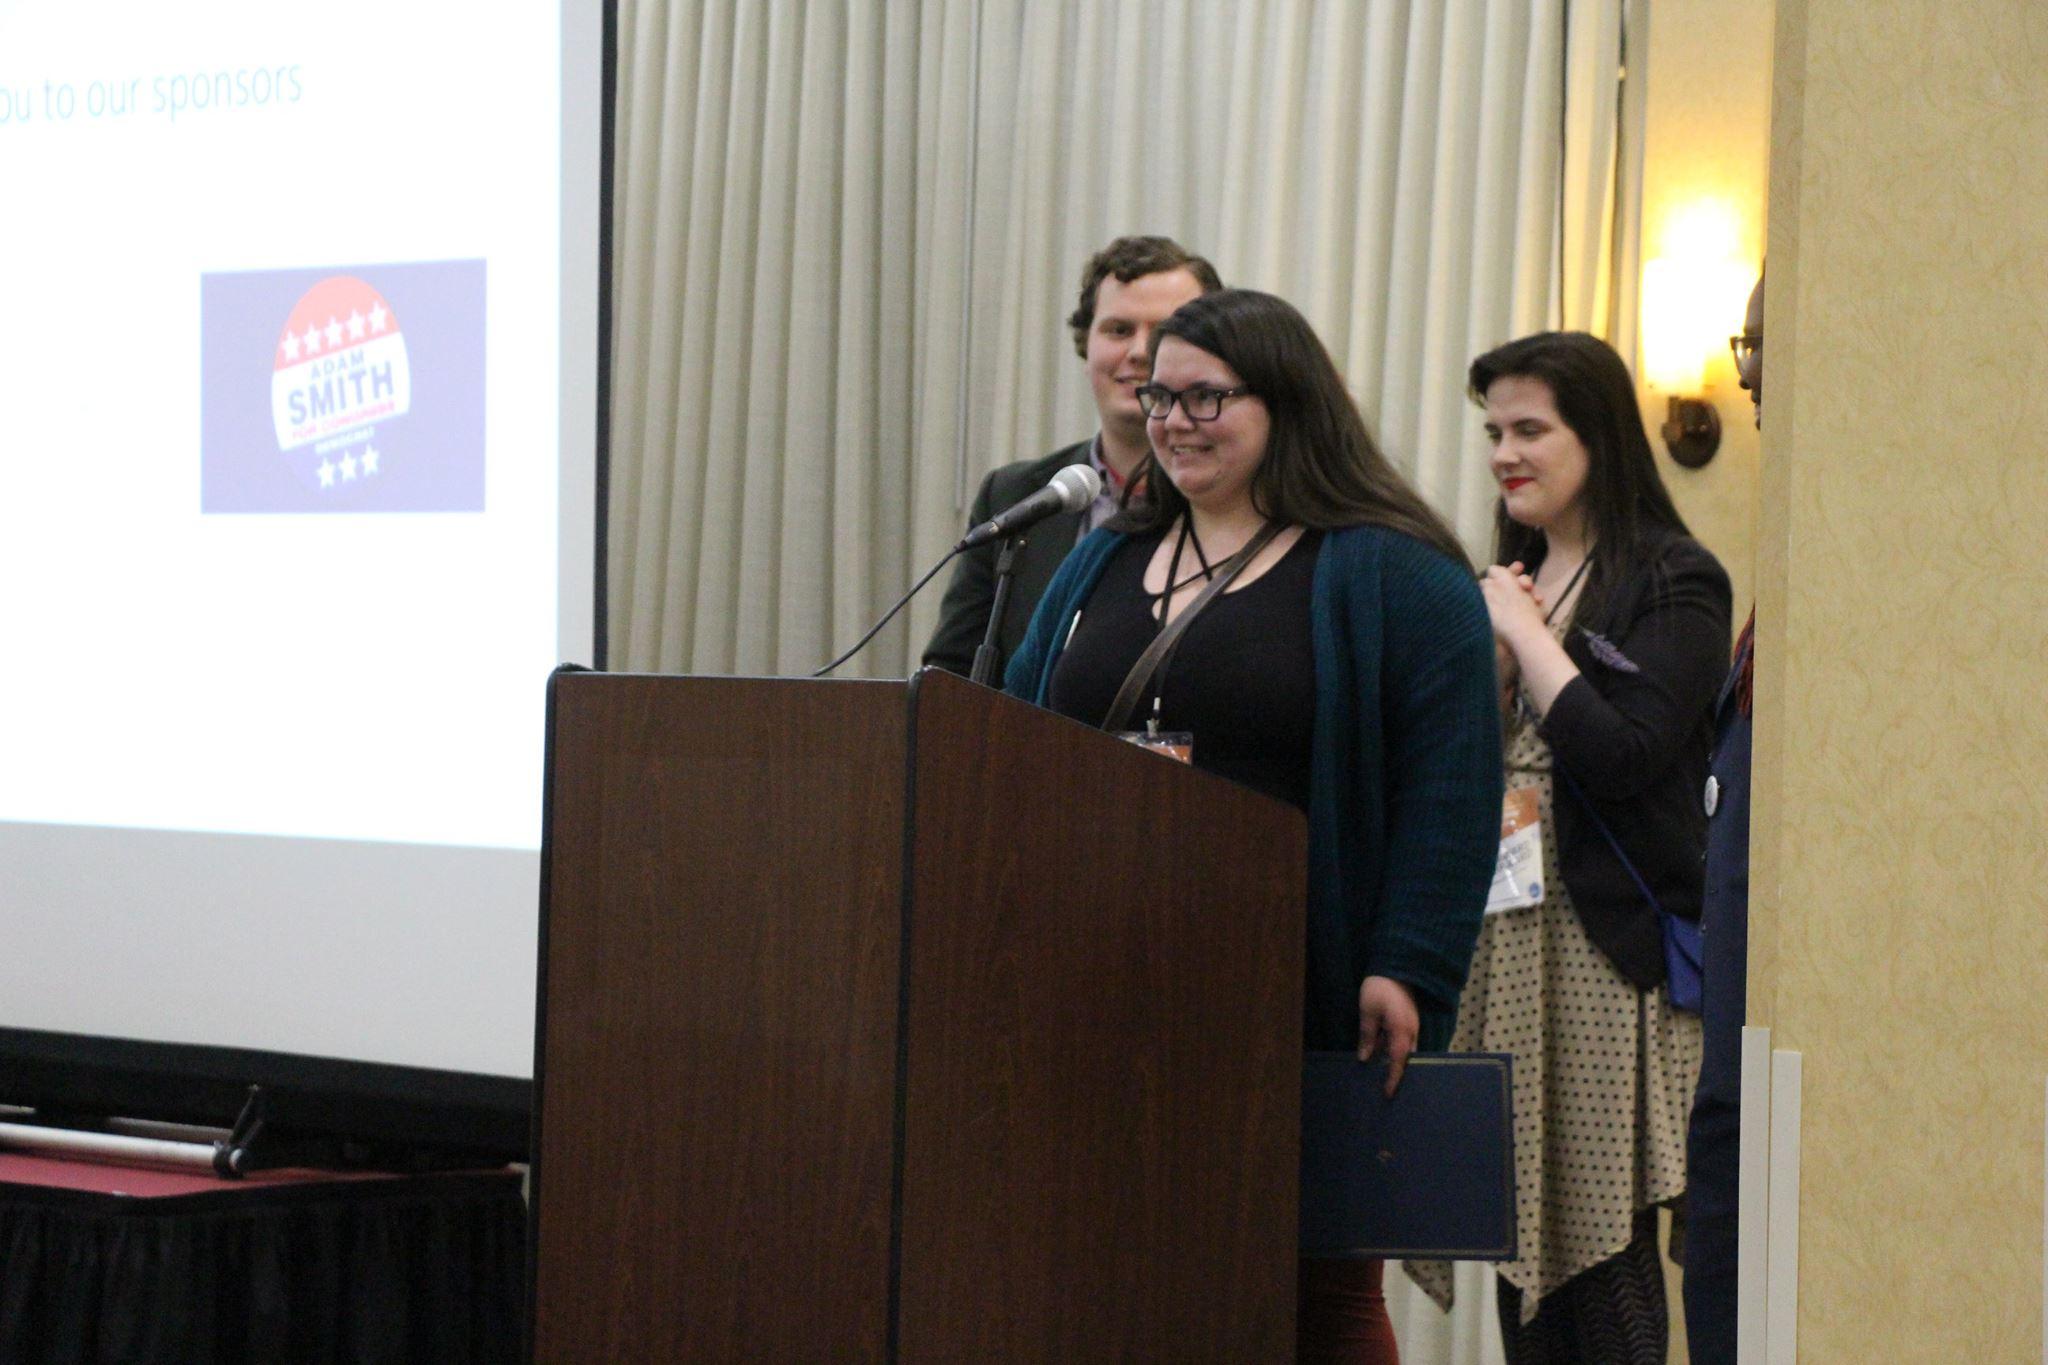 Young Democrat of the Year 2018 winner Emily Provencio